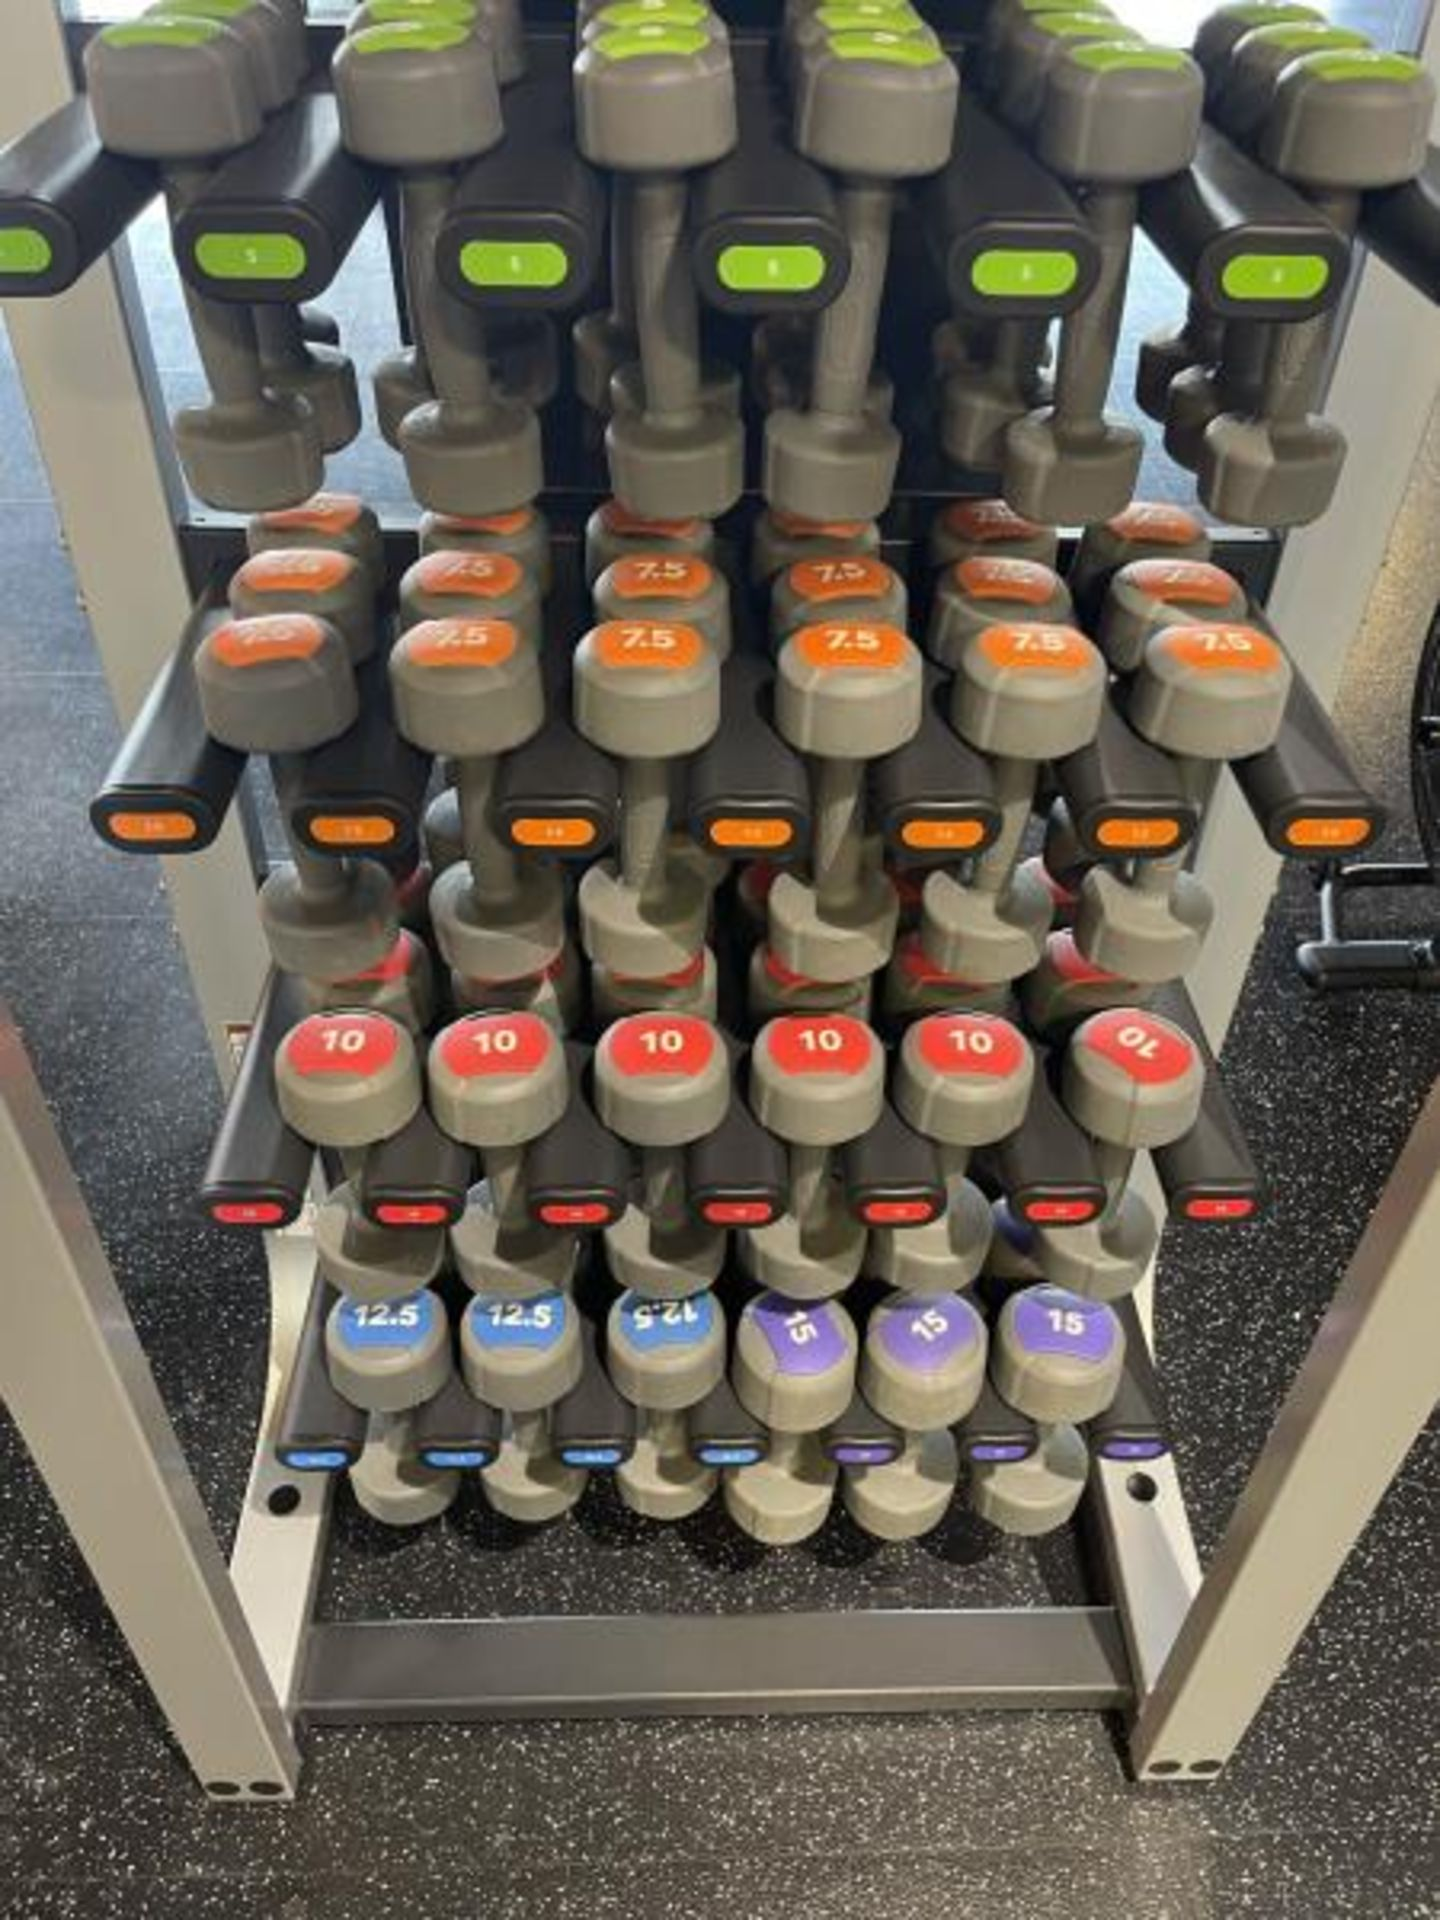 Life Fitness Dumbbell Rack, Coated, Lift Fitness Dumbbells 2.5, 5, 7.5, 10, 12.5, 15 LBS - Image 3 of 4